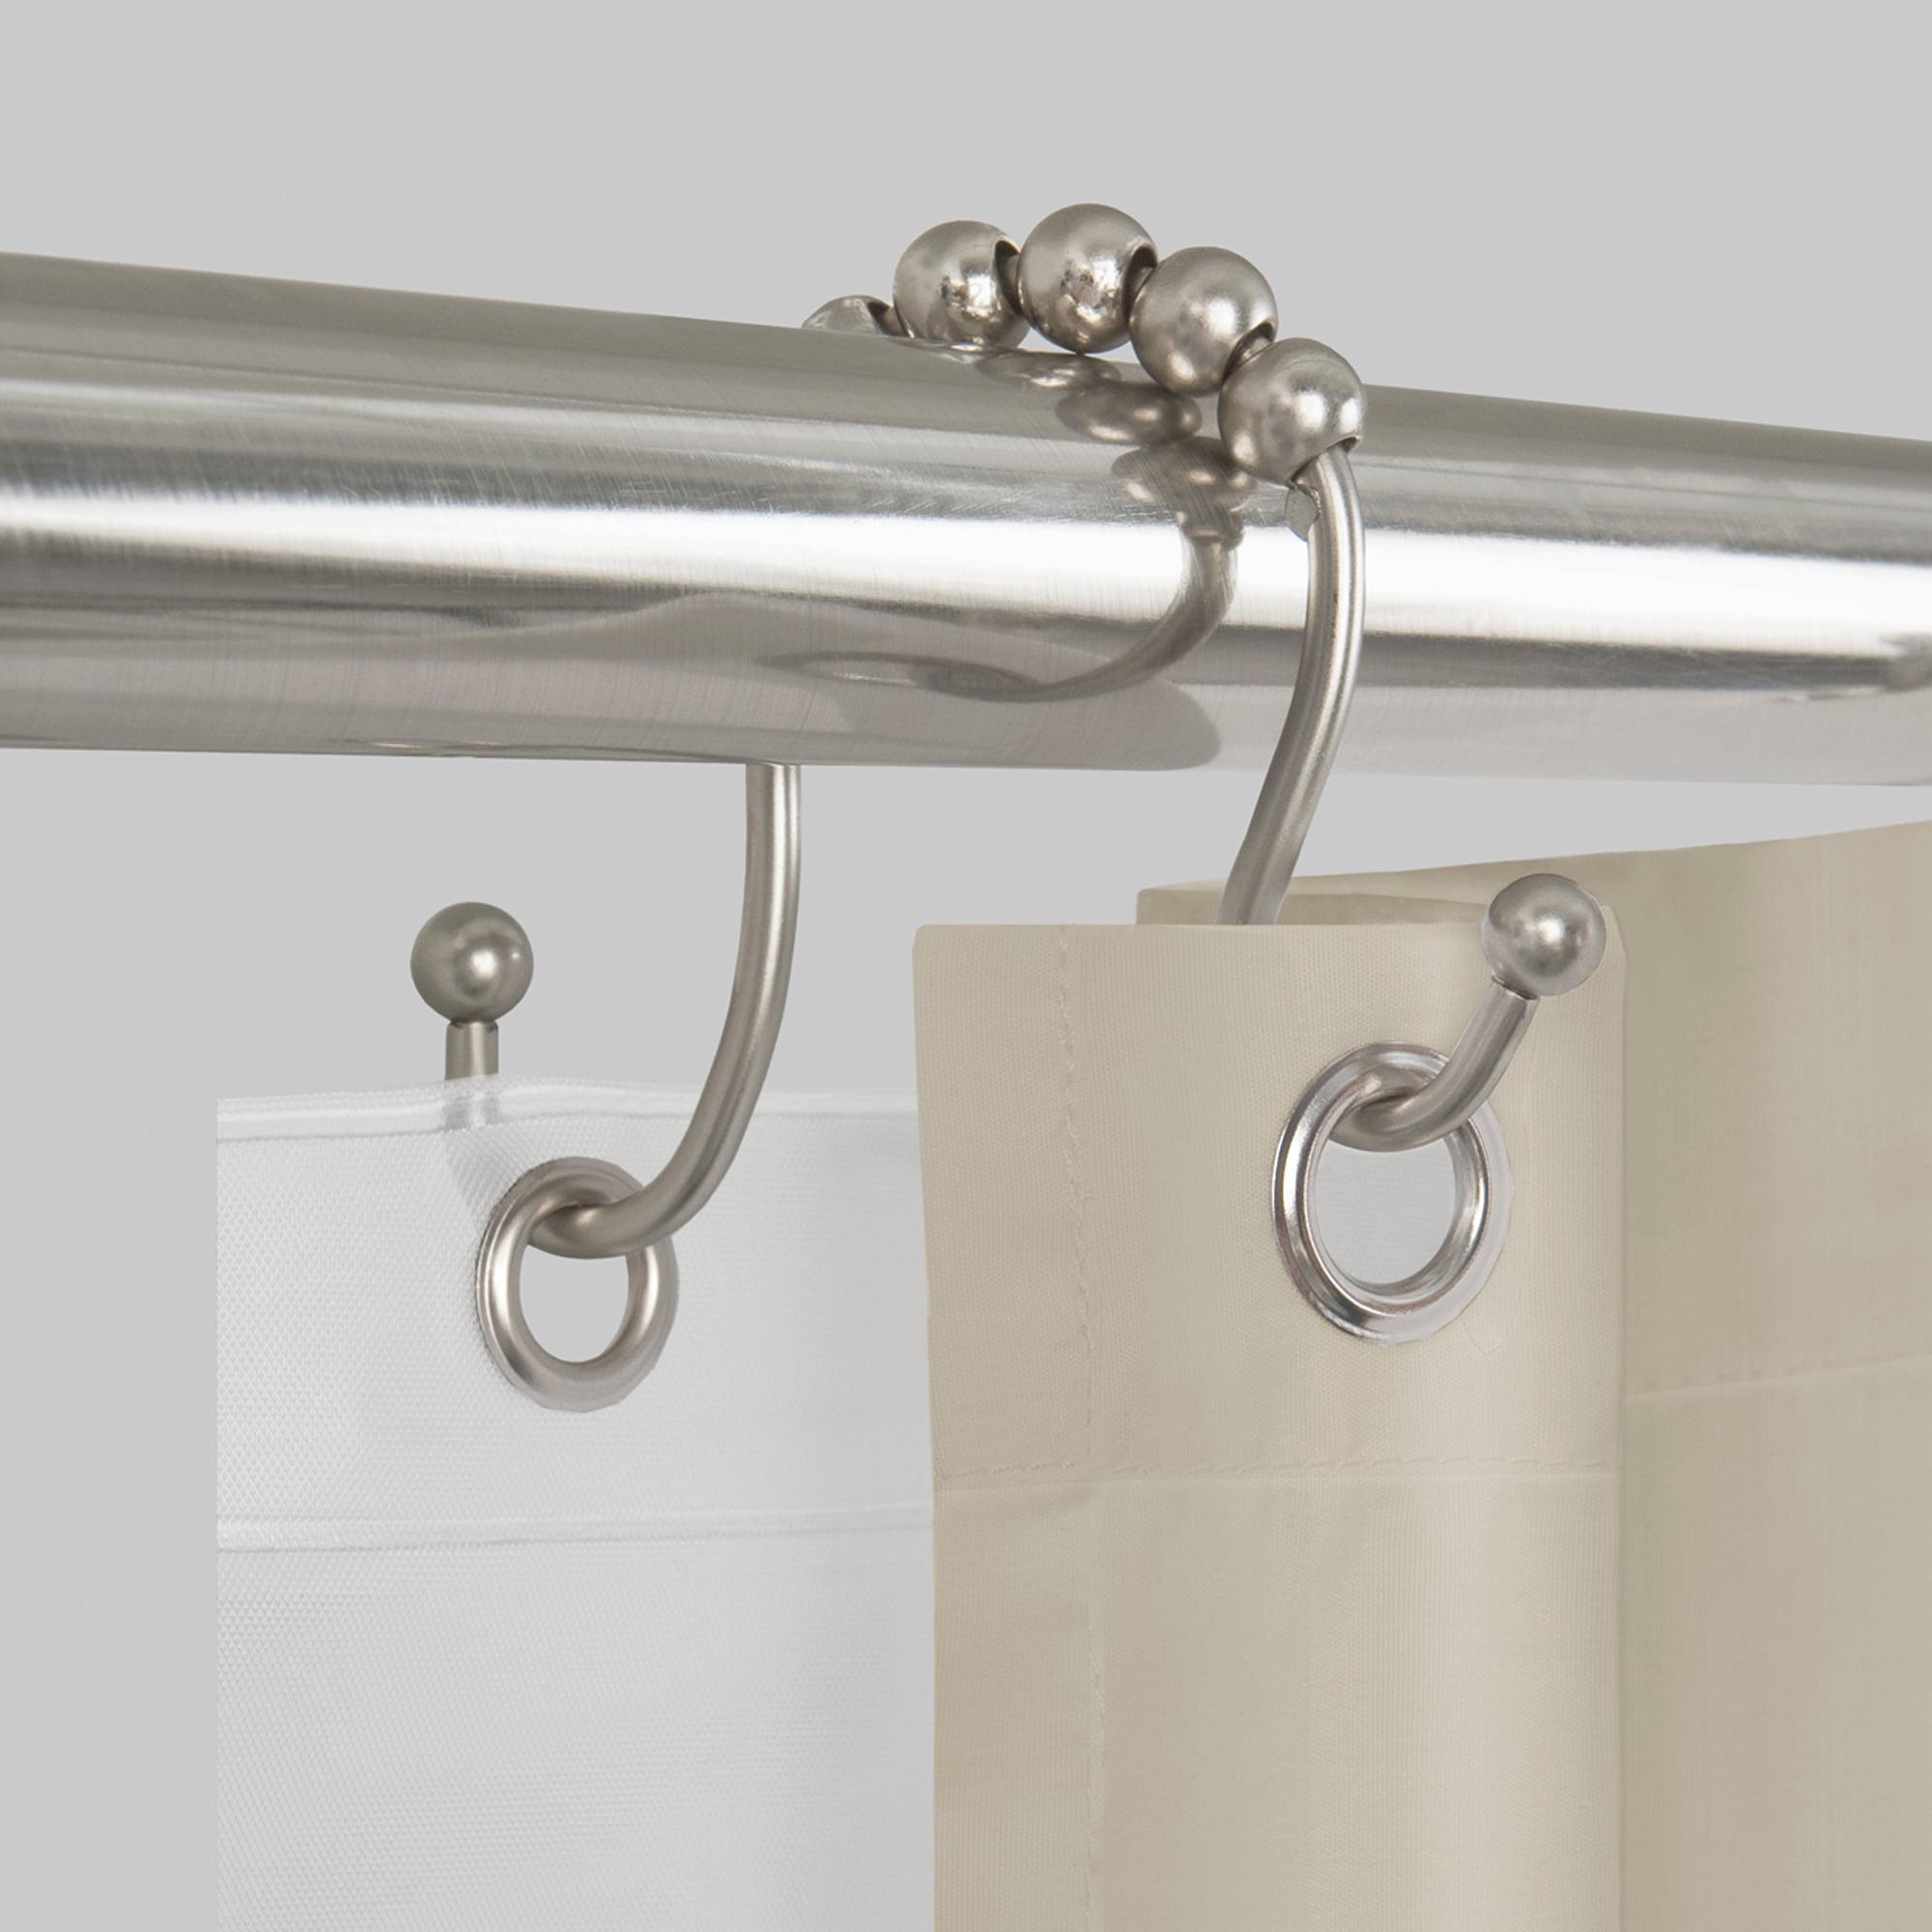 EZ-FLO 15105 Shower Curtain Ring